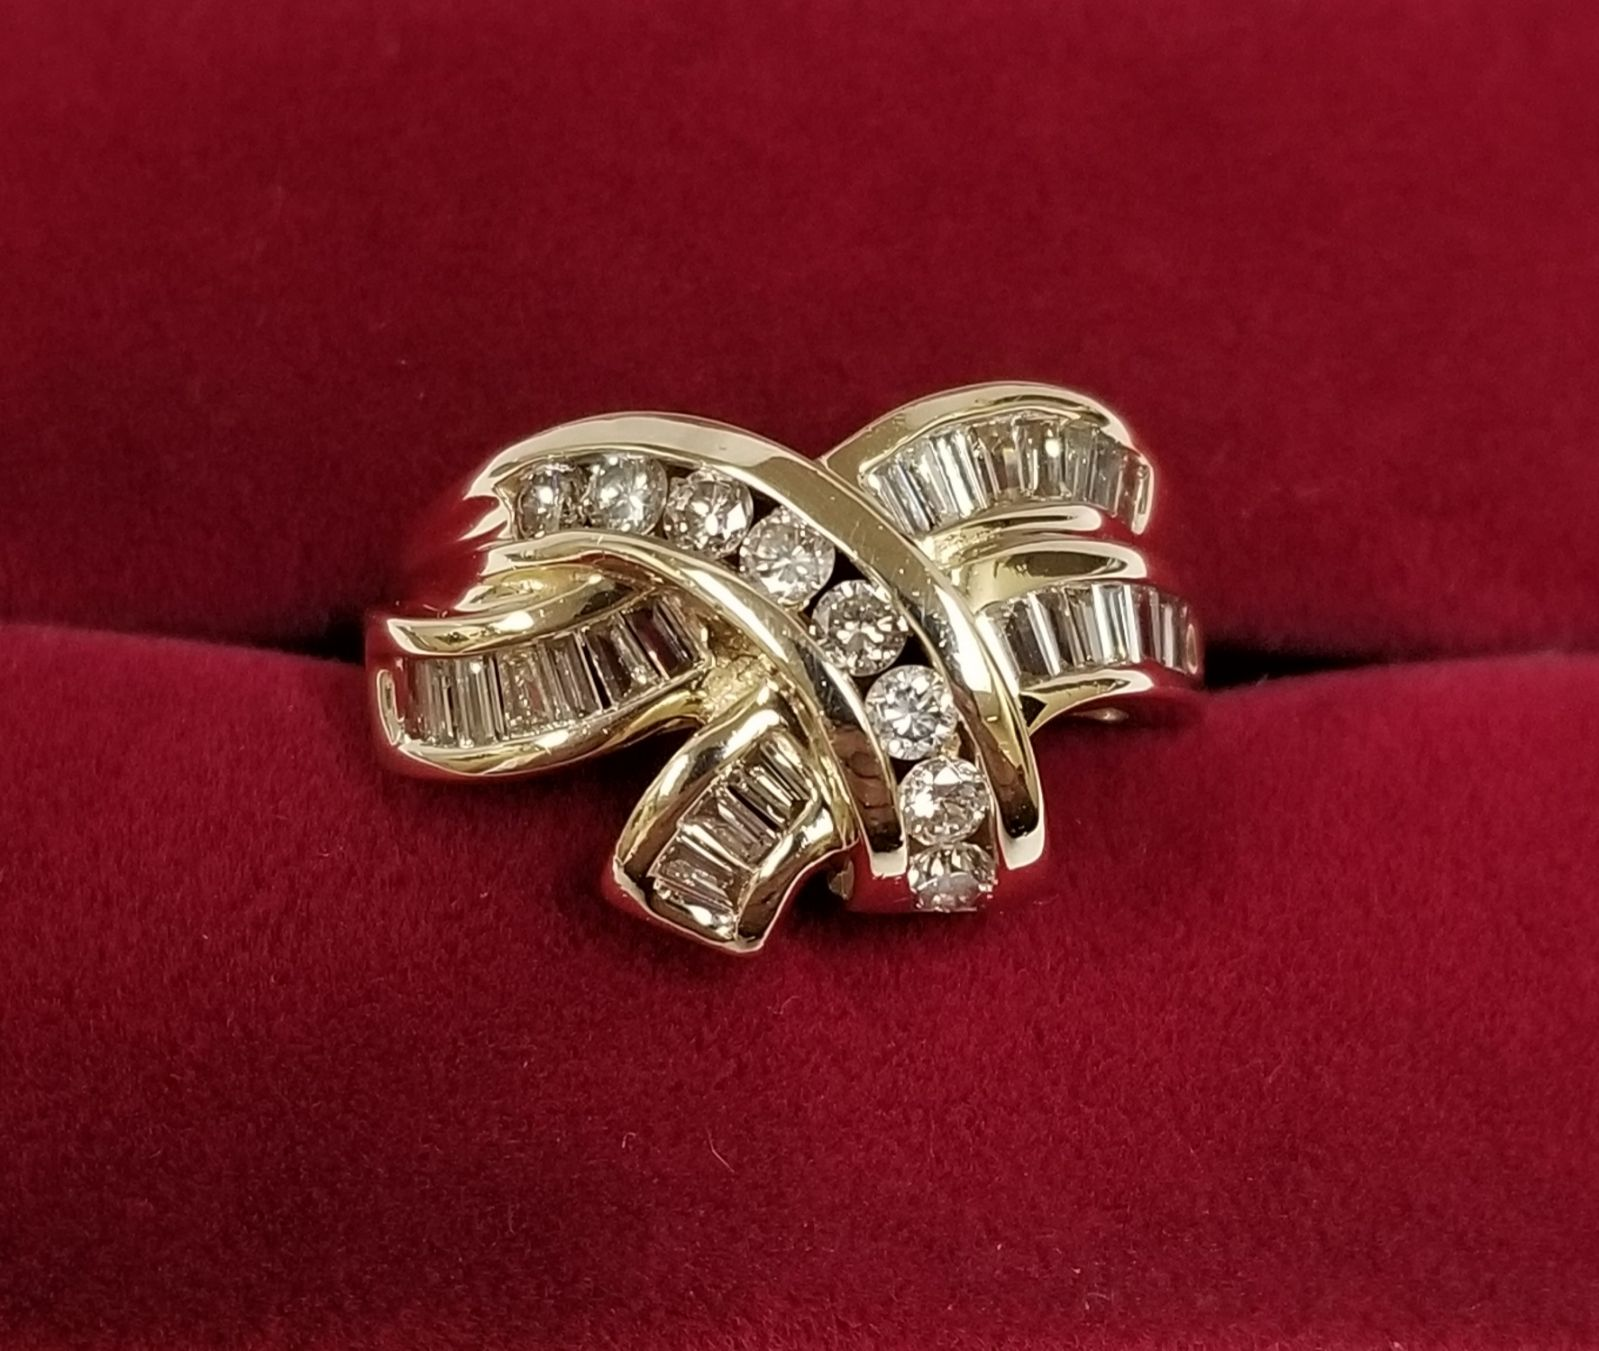 10k Gold Diamond Cocktail Swirl Ring